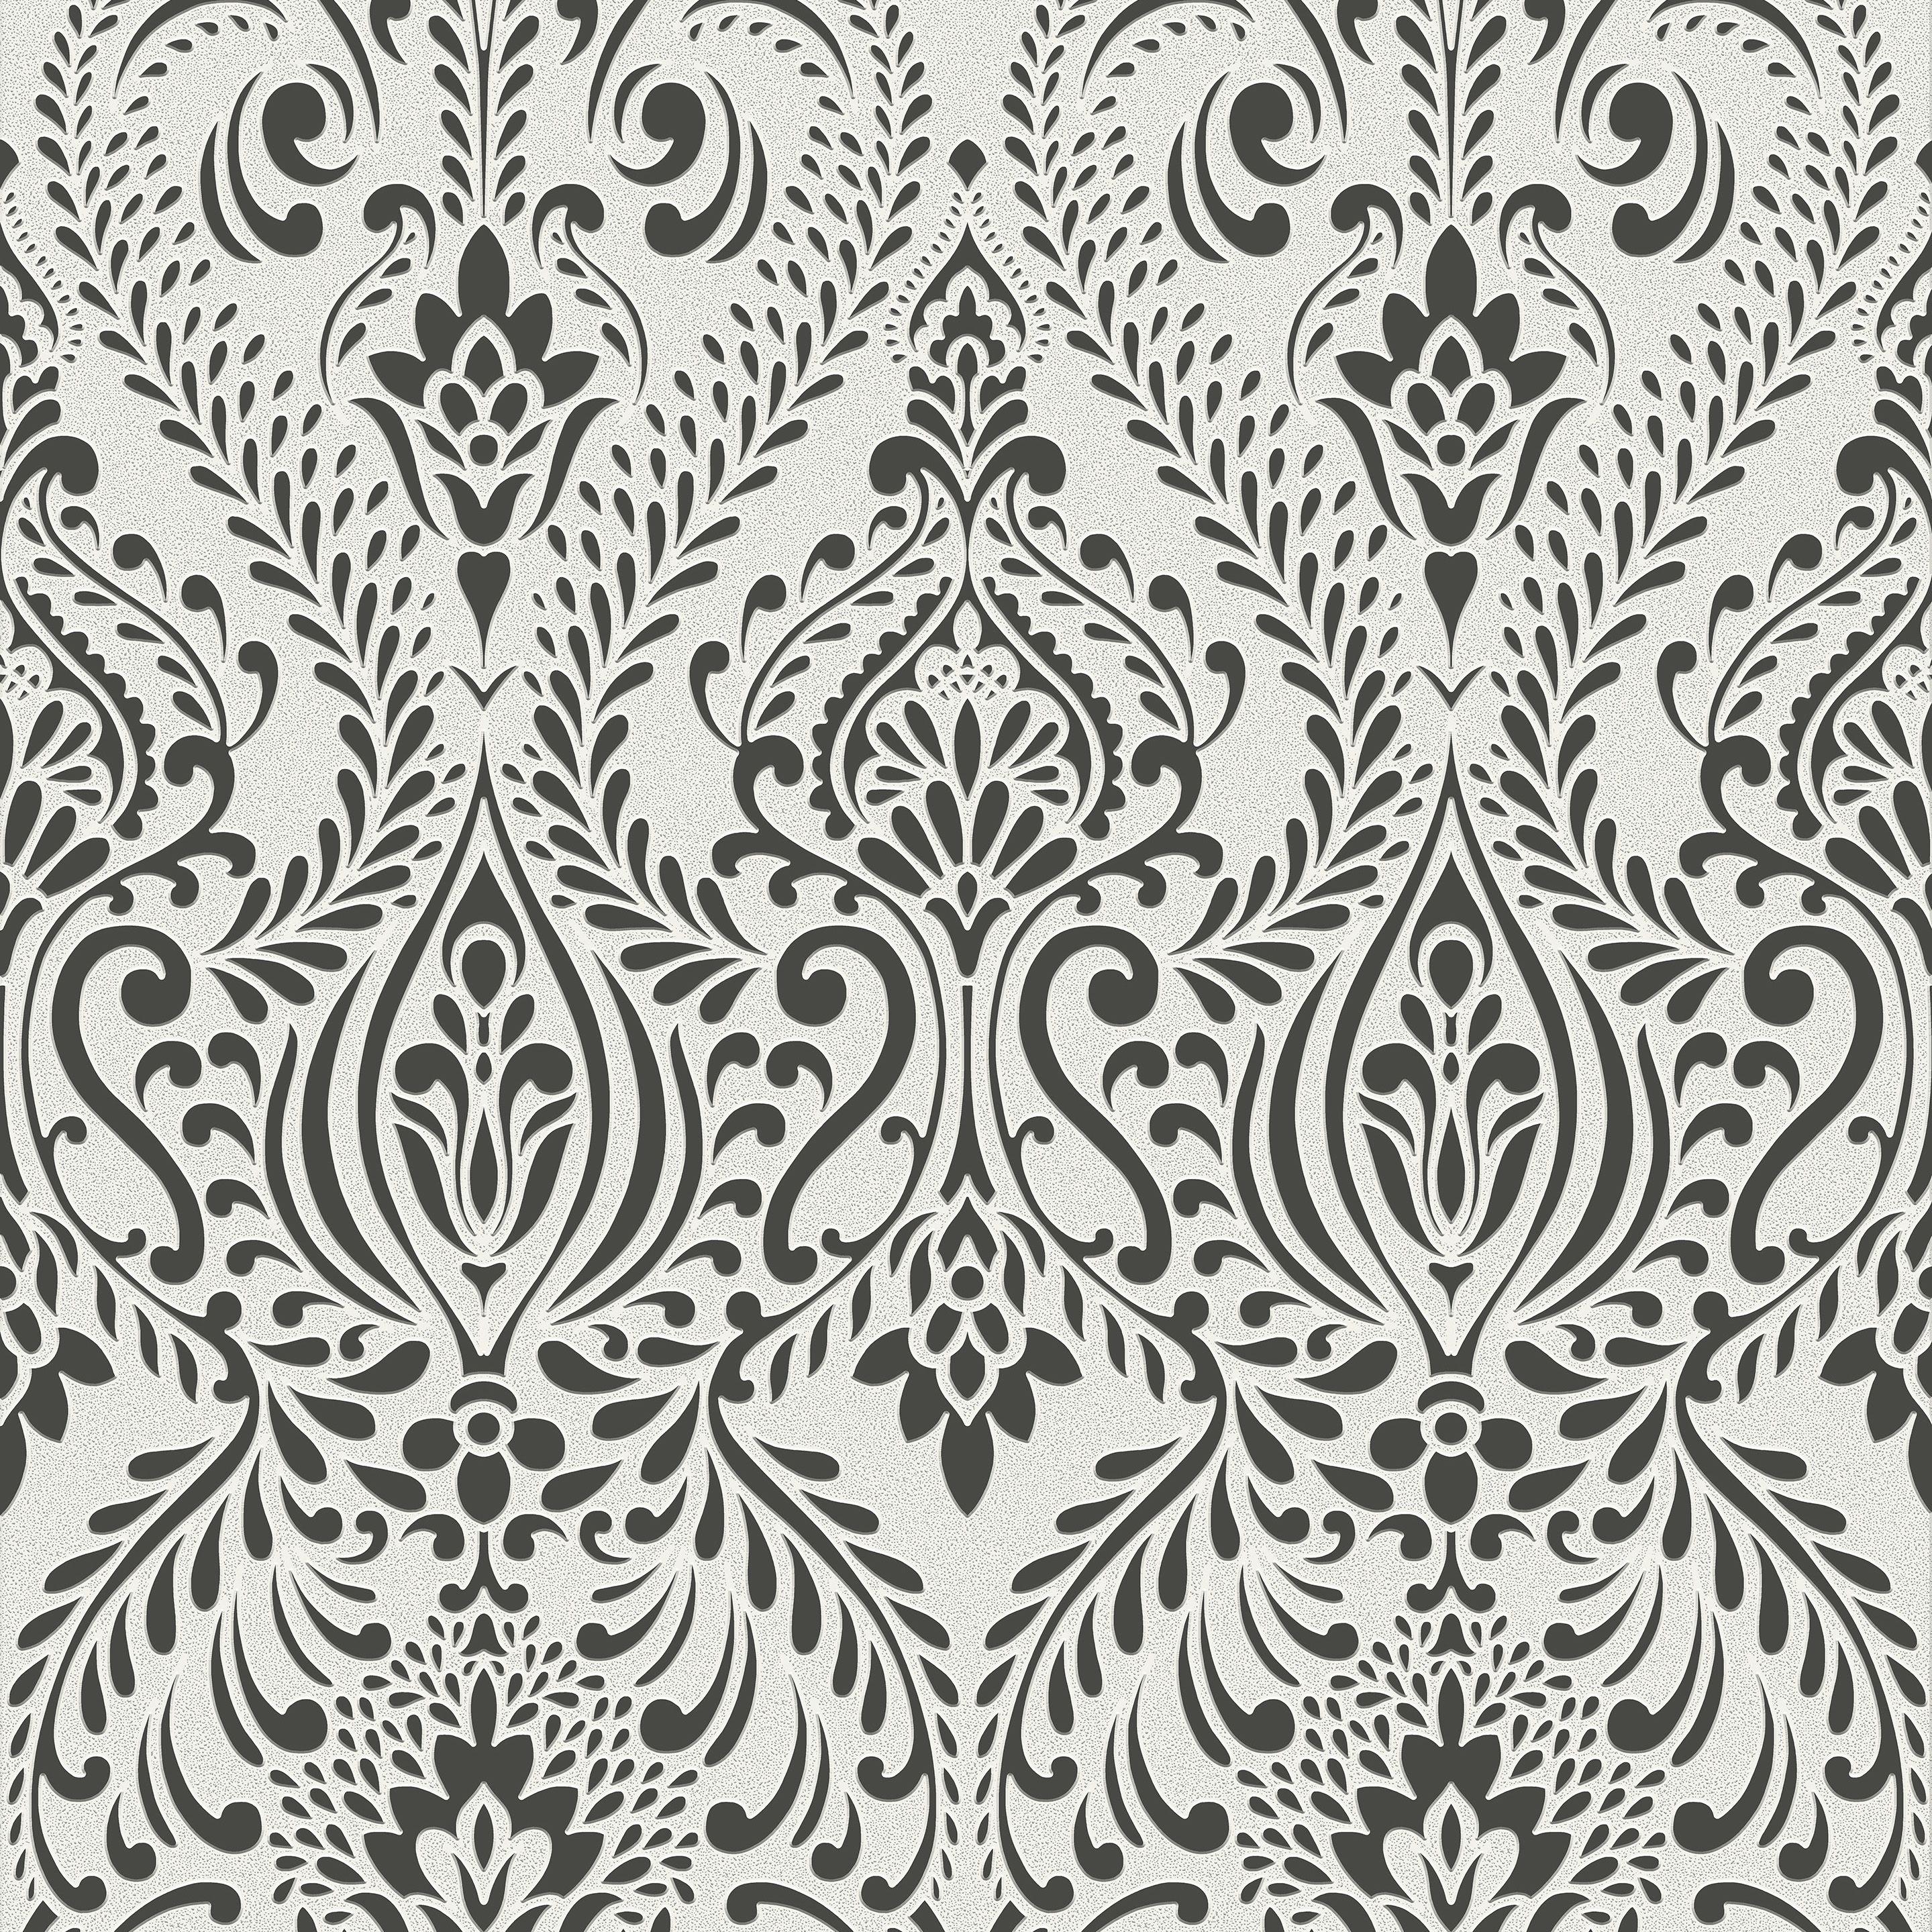 Graham Brown Superfresco Black White Damask Wallpaper